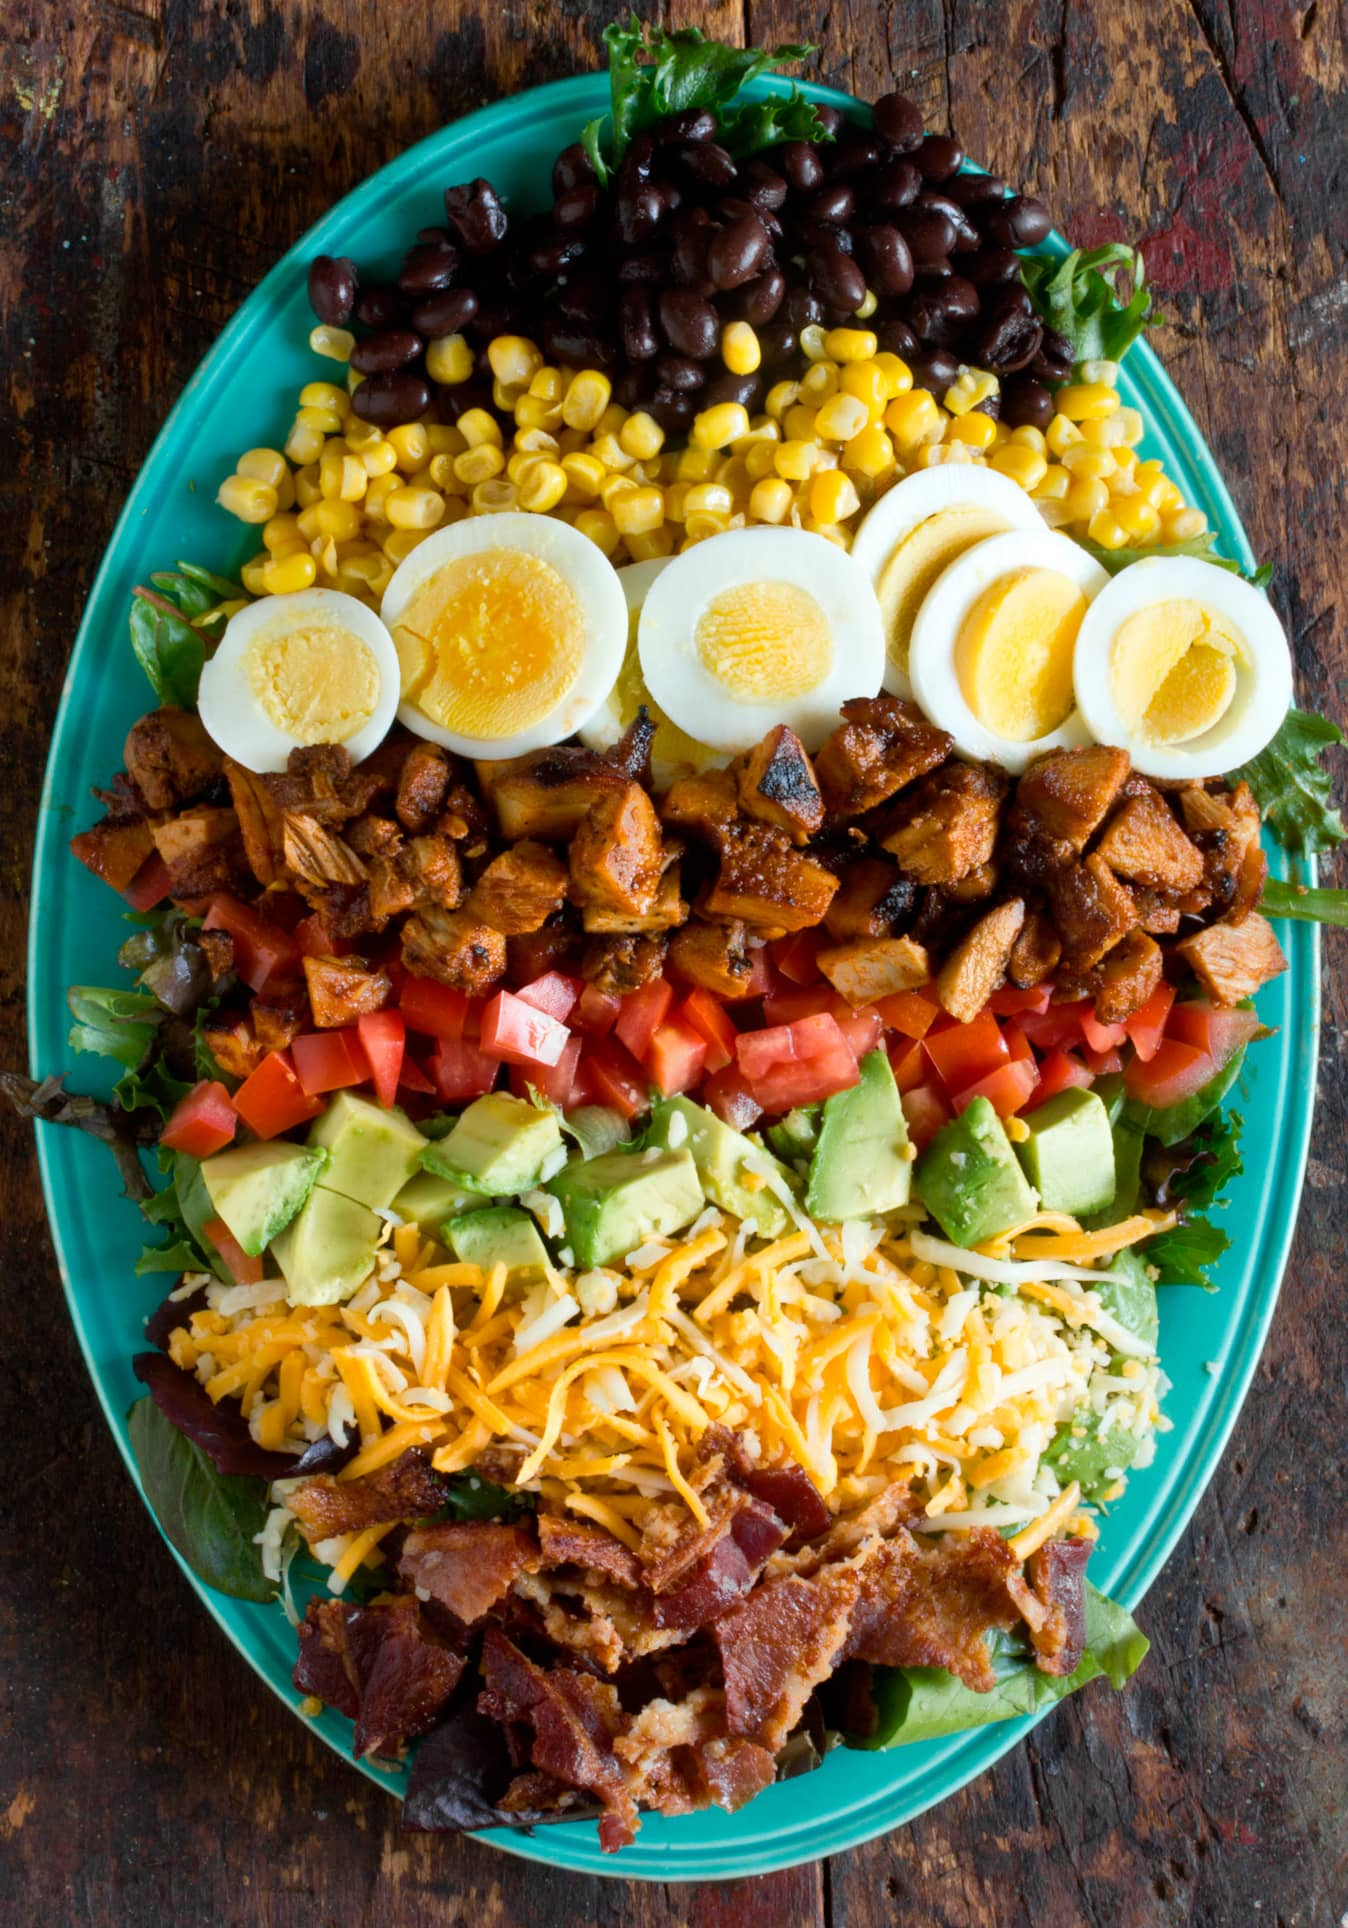 Recipe: BBQ Chicken Cobb Salad